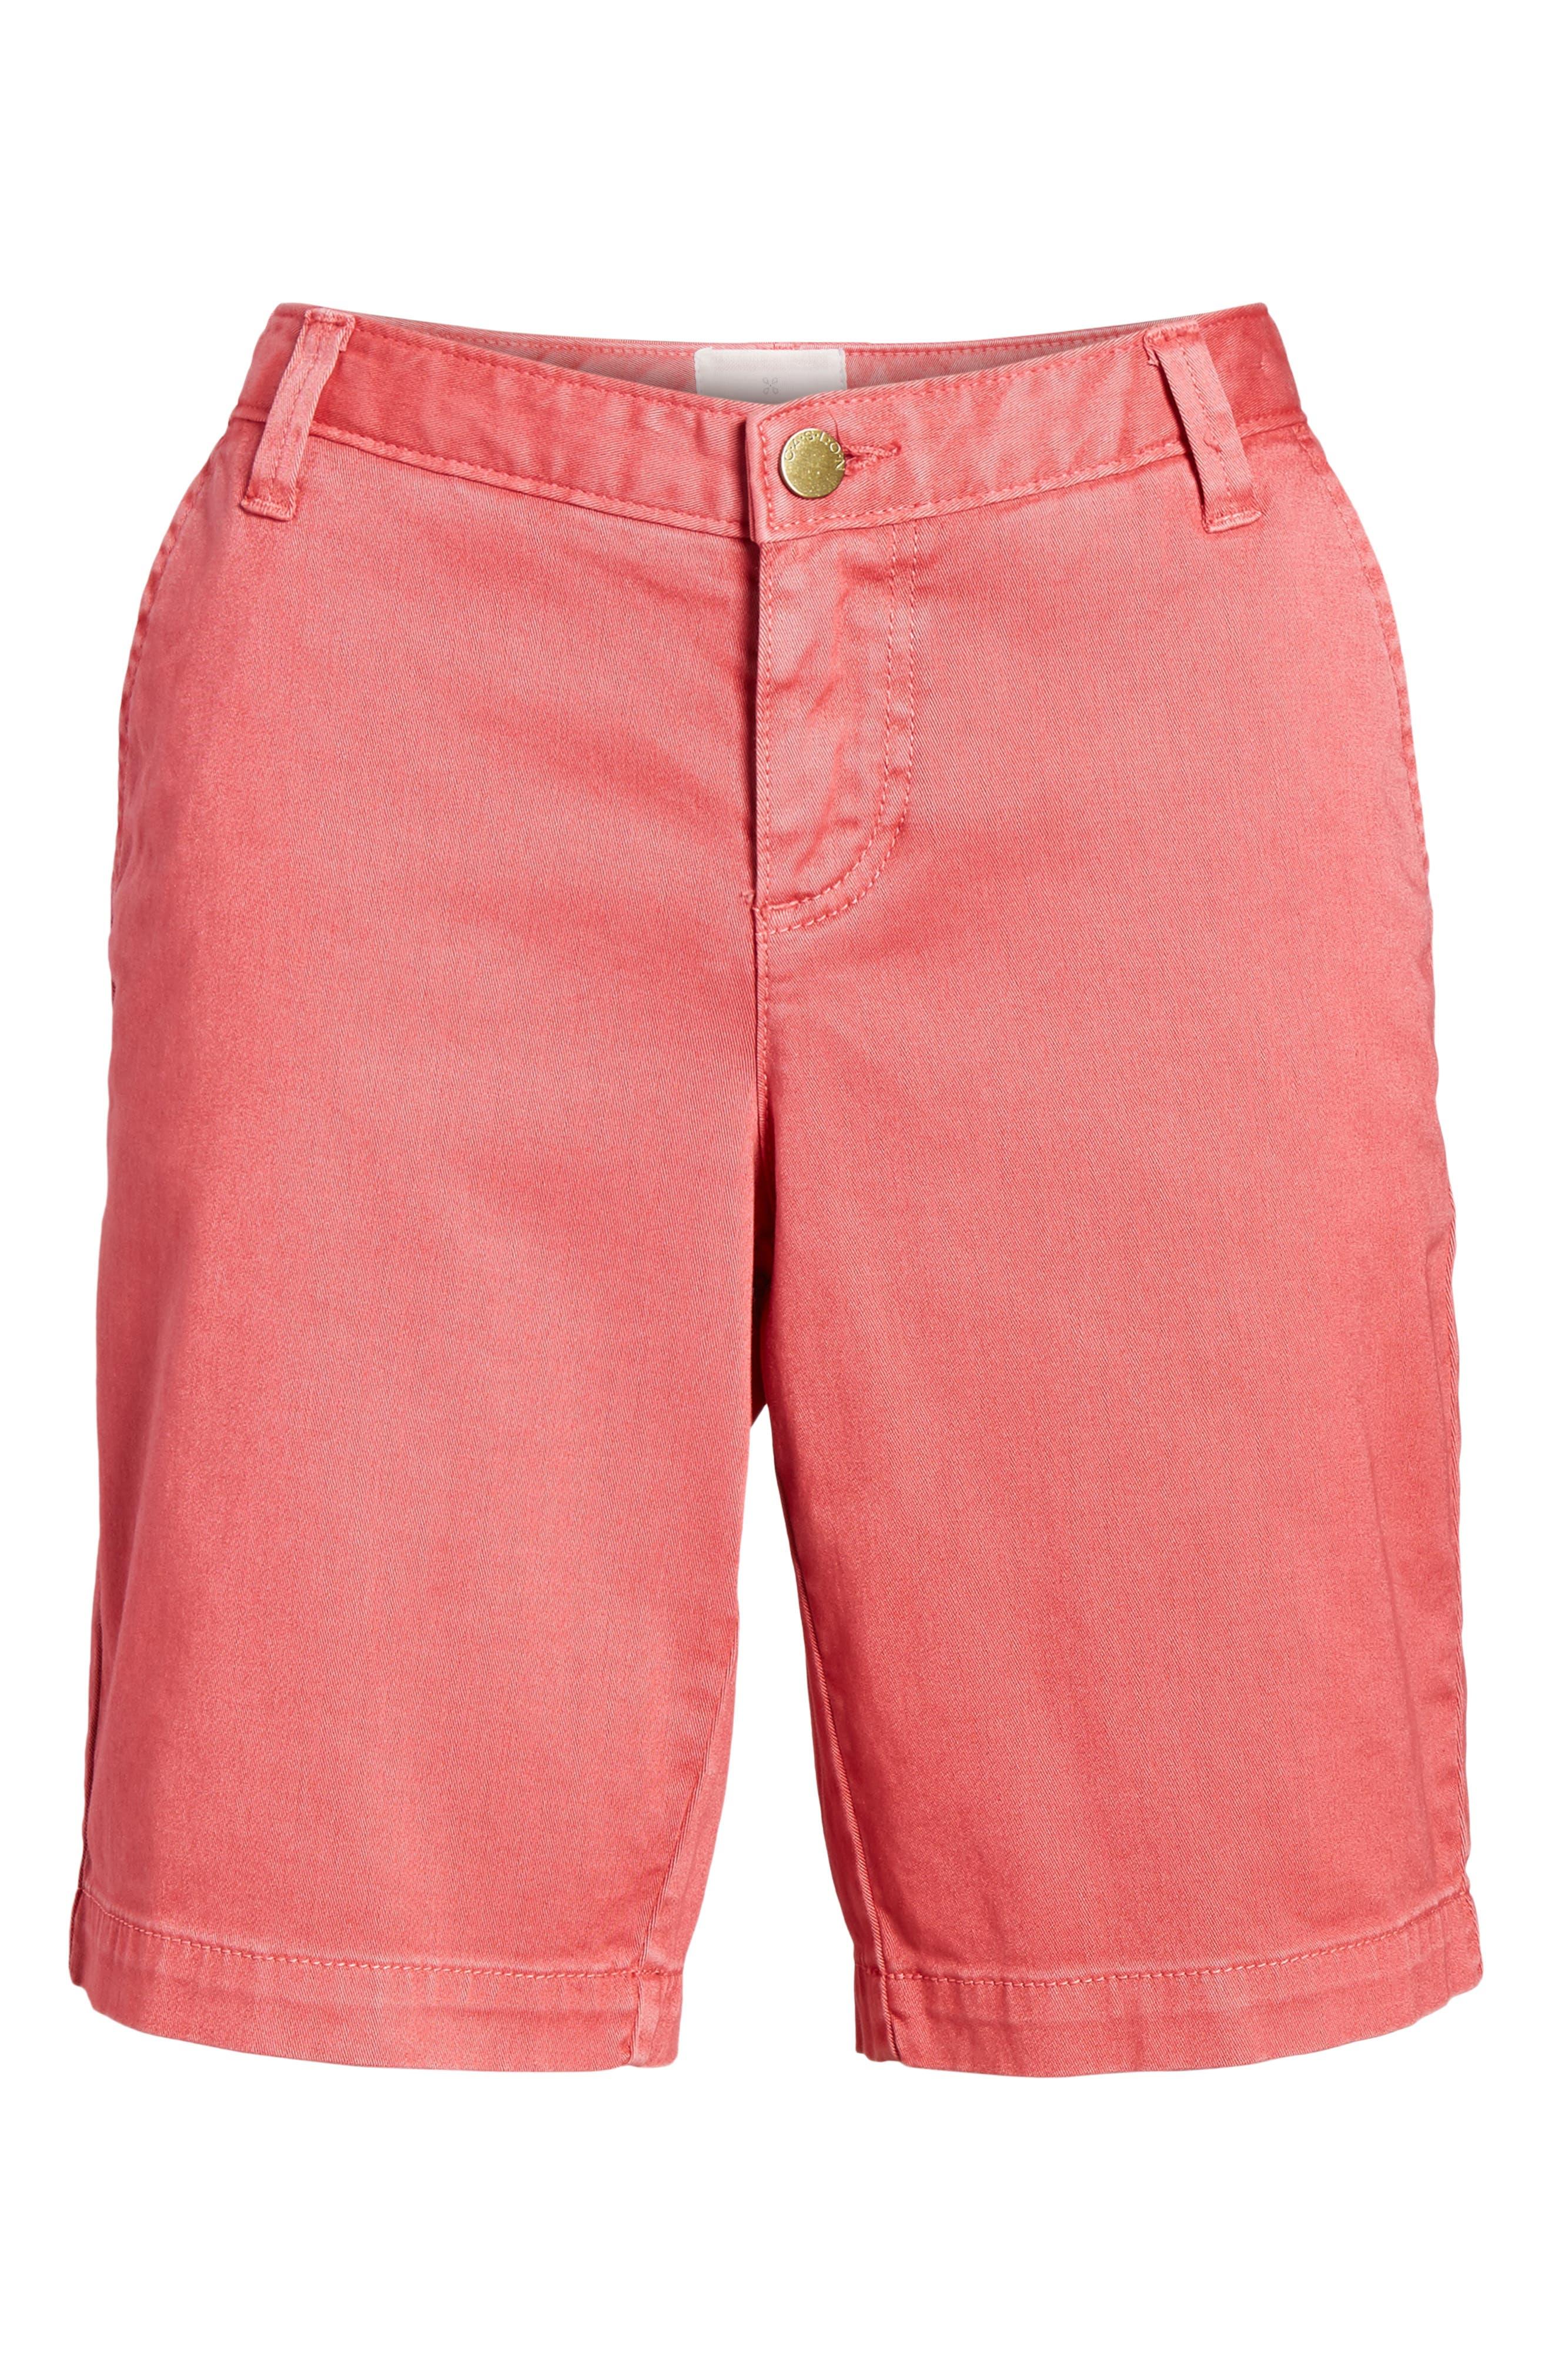 Twill Shorts,                             Alternate thumbnail 55, color,